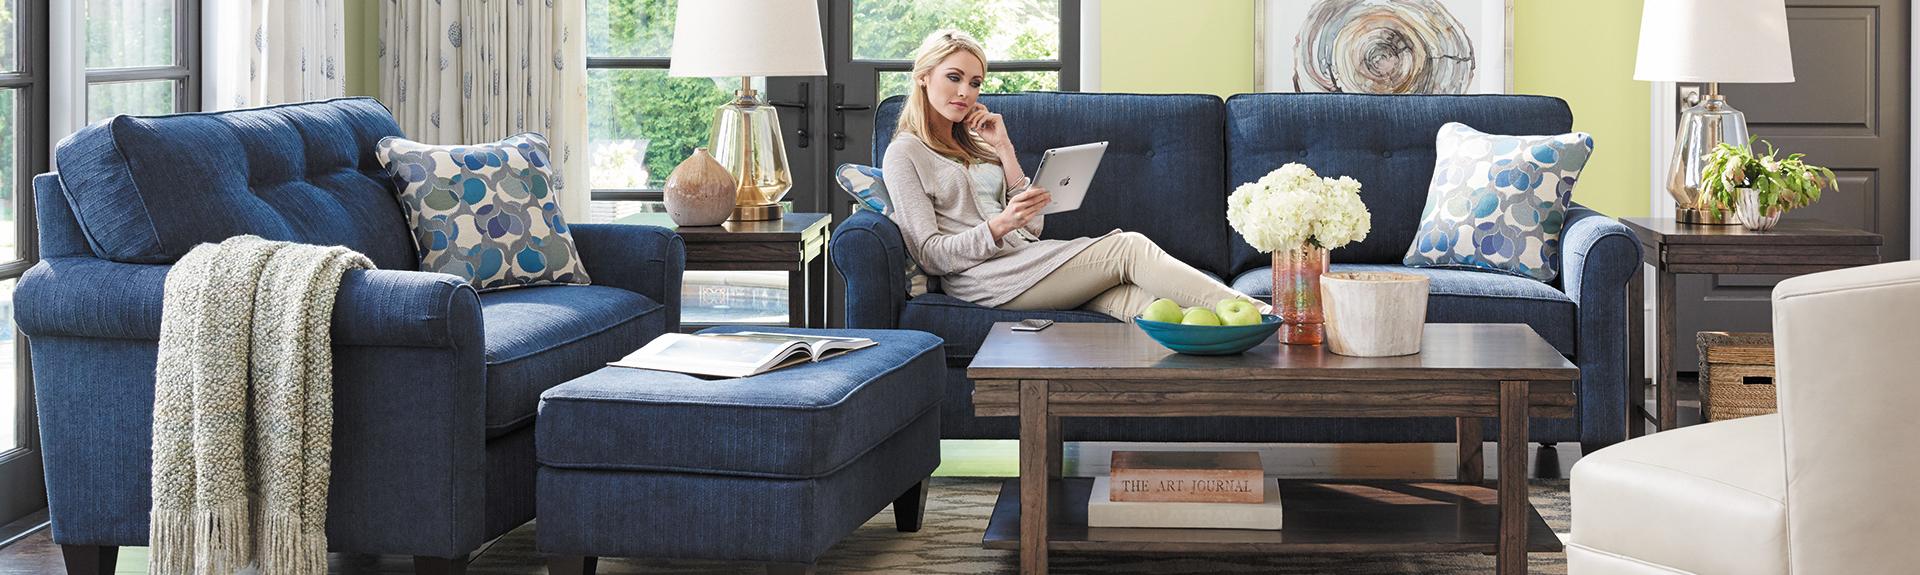 Bring Your Interior Design Ideas To Life